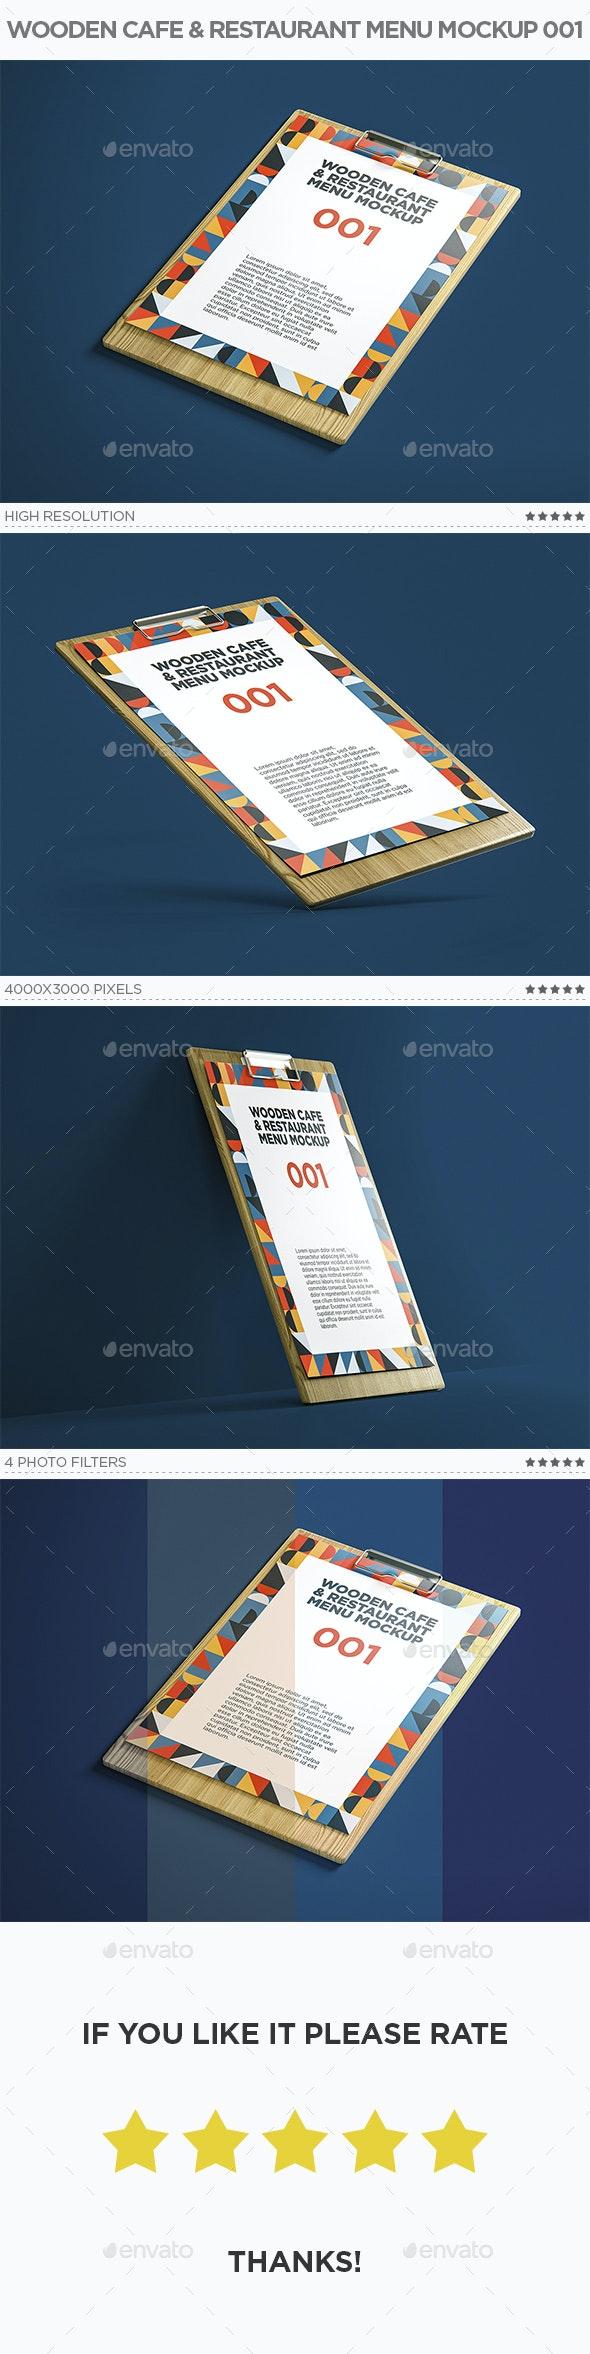 Wooden Cafe & Restaurant Menu Mockup 001 - Miscellaneous Print